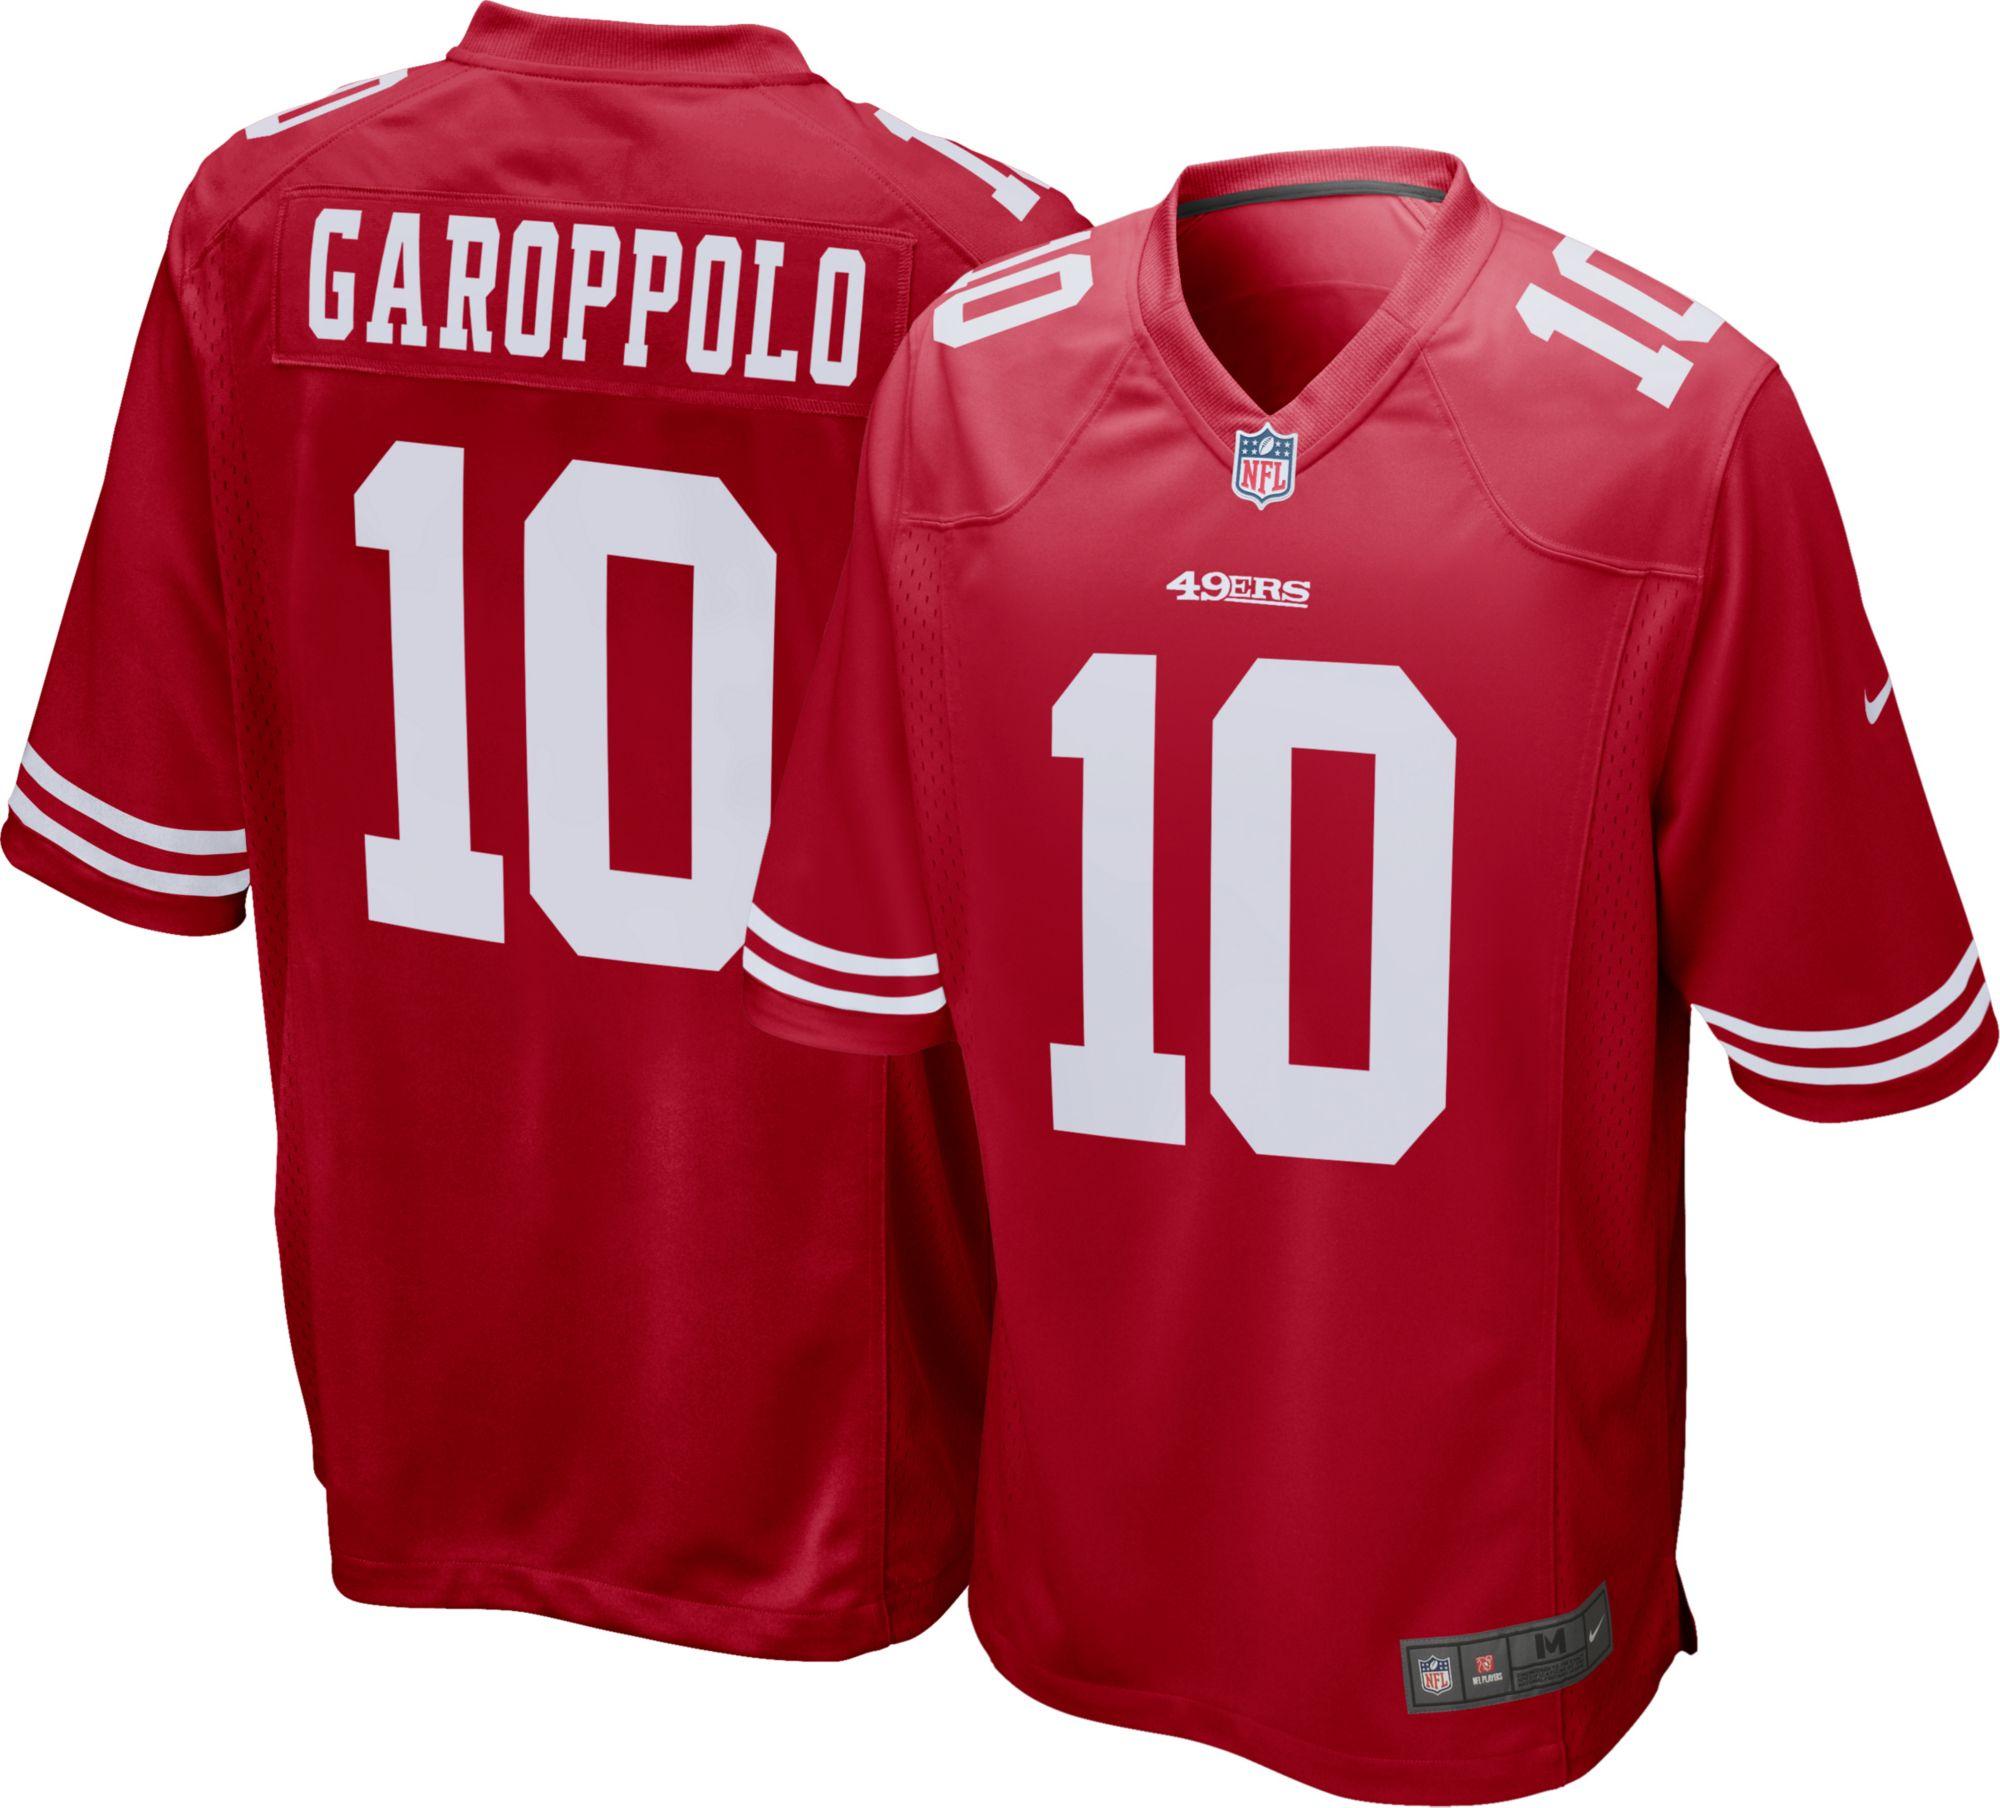 a89a5f1c7 ... Nike Mens Home Game Jersey San Francisco 49ers Jimmy Garoppolo 10 ...